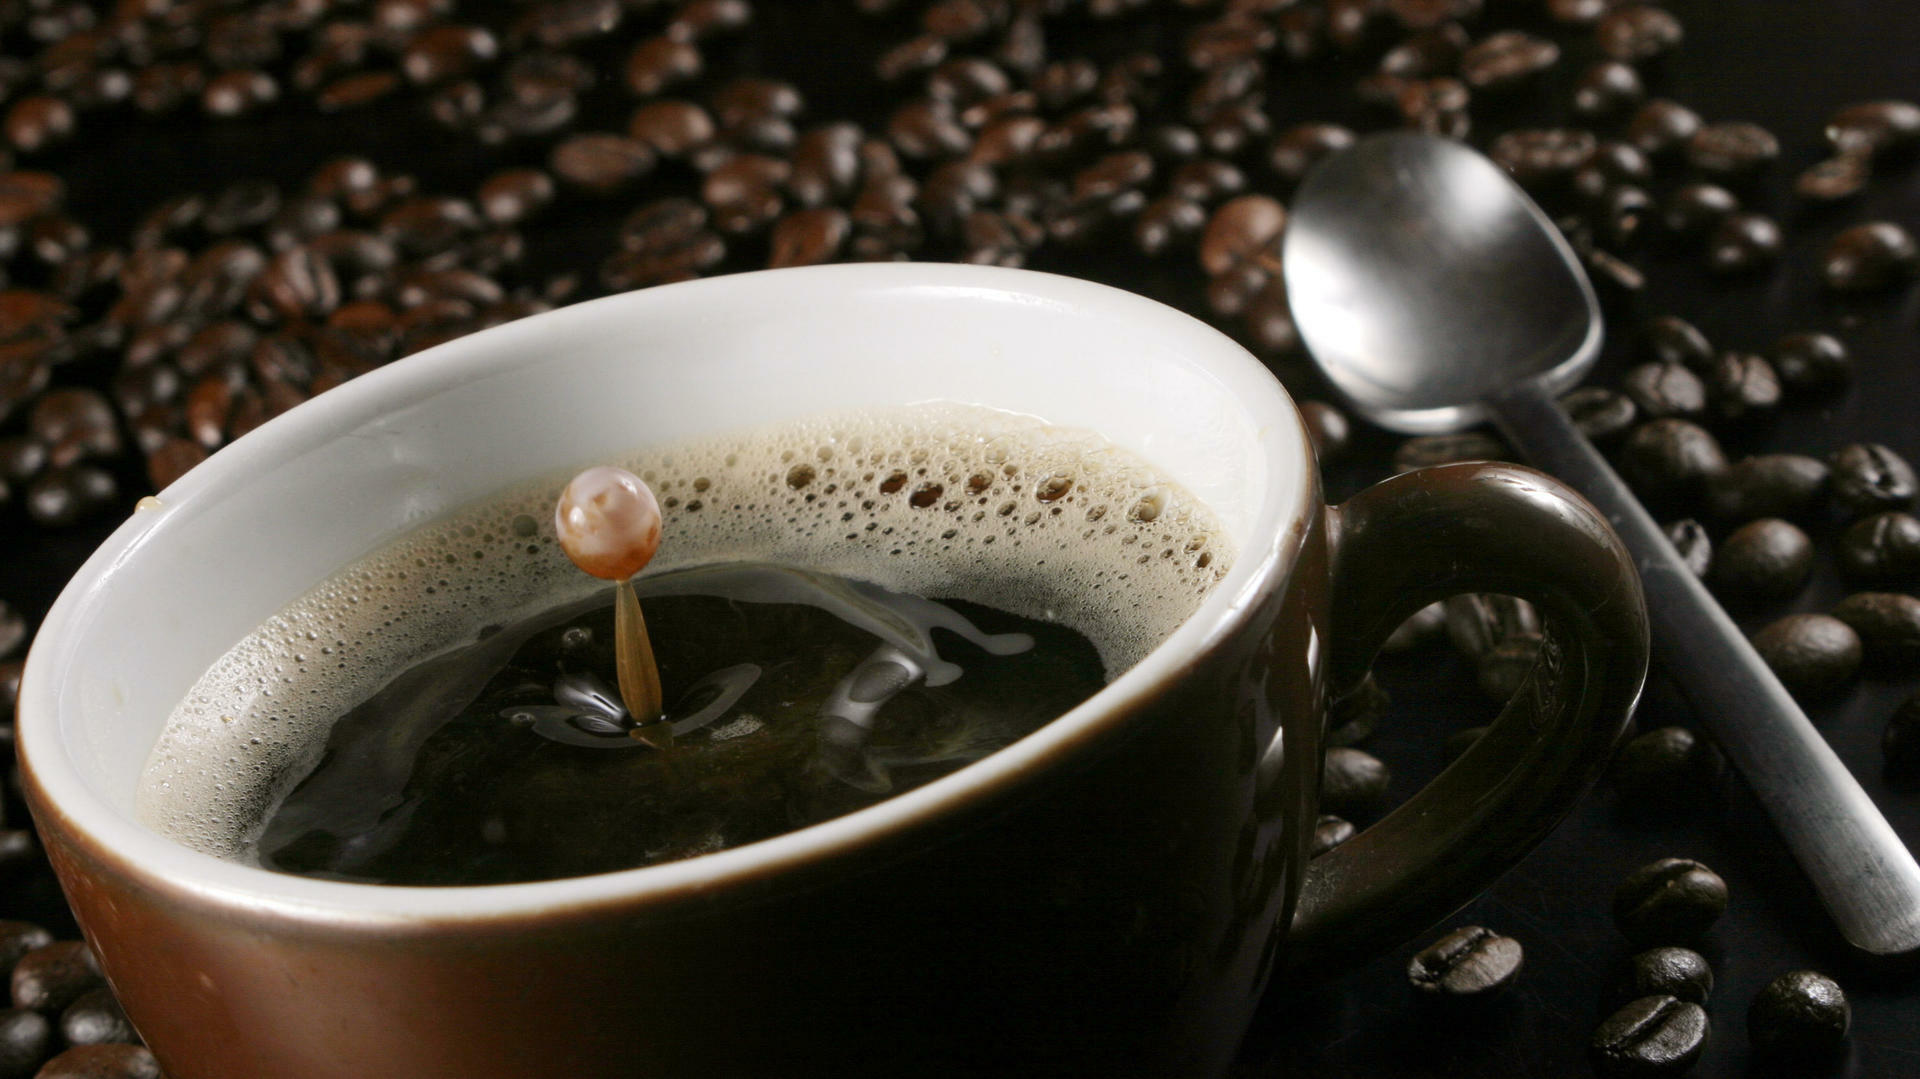 Frauen wollen männer wie kaffee